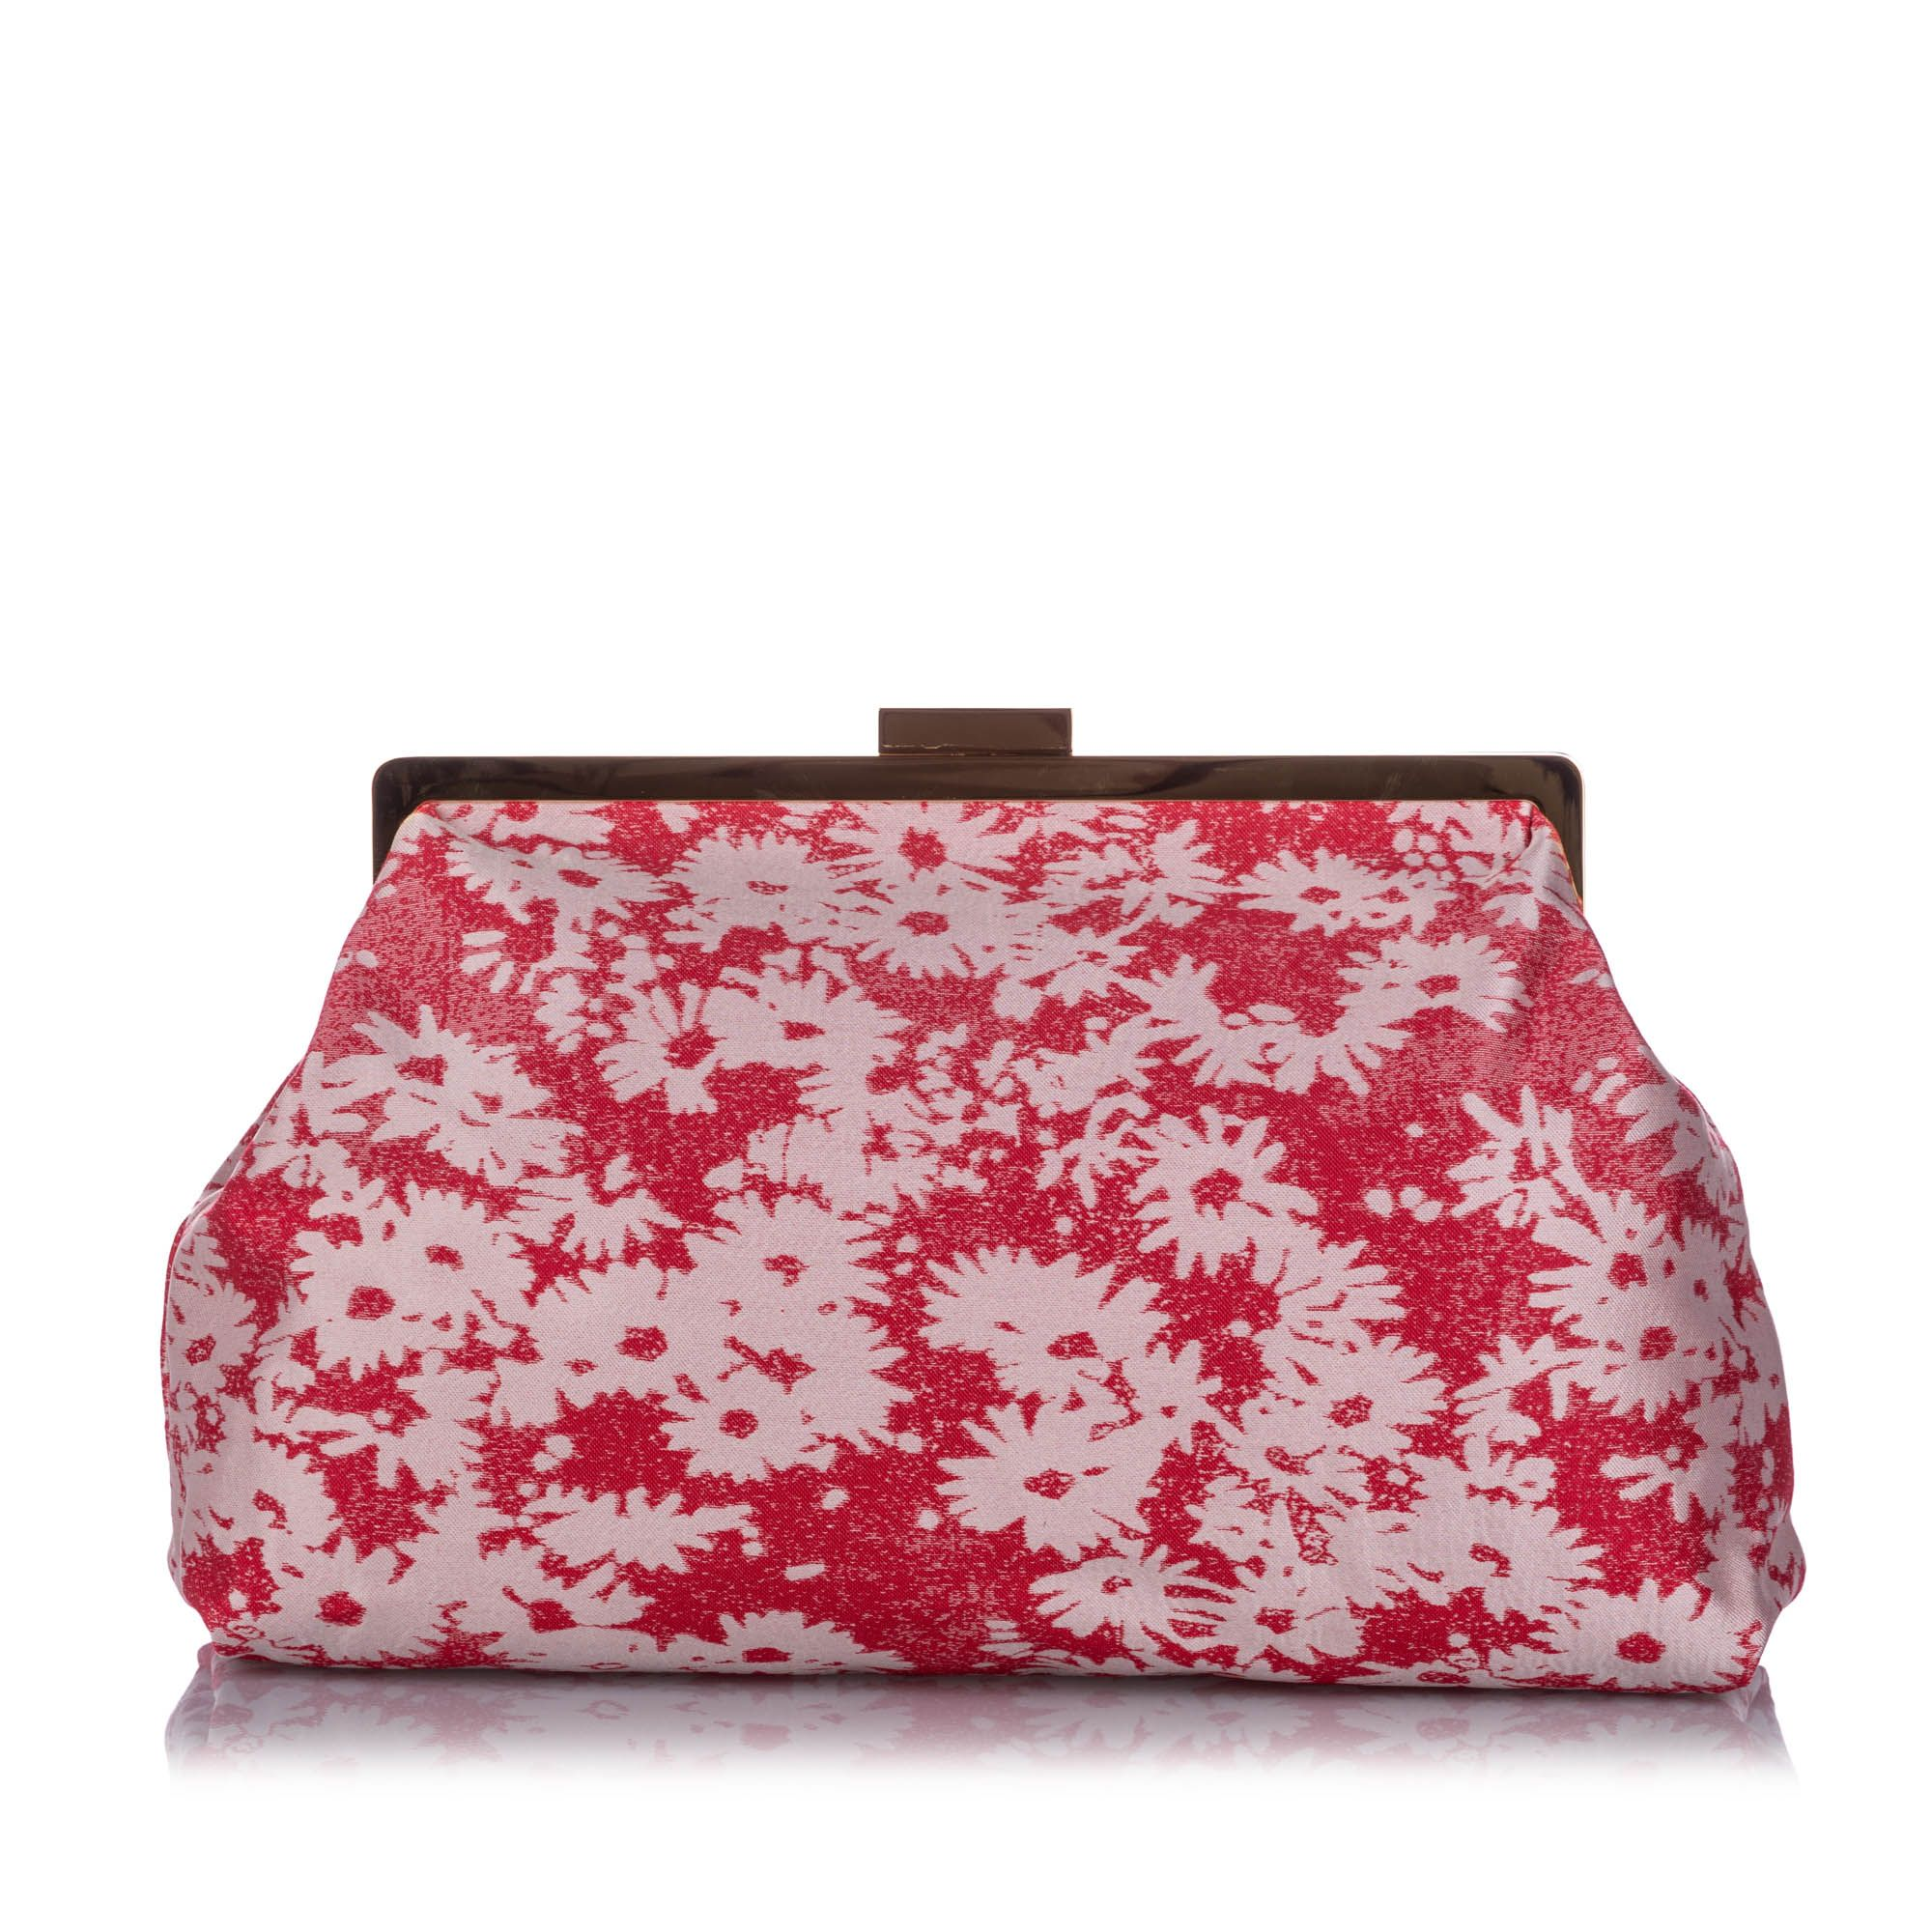 Vintage Stella McCartney Daisy Canvas Clutch Bag Pink